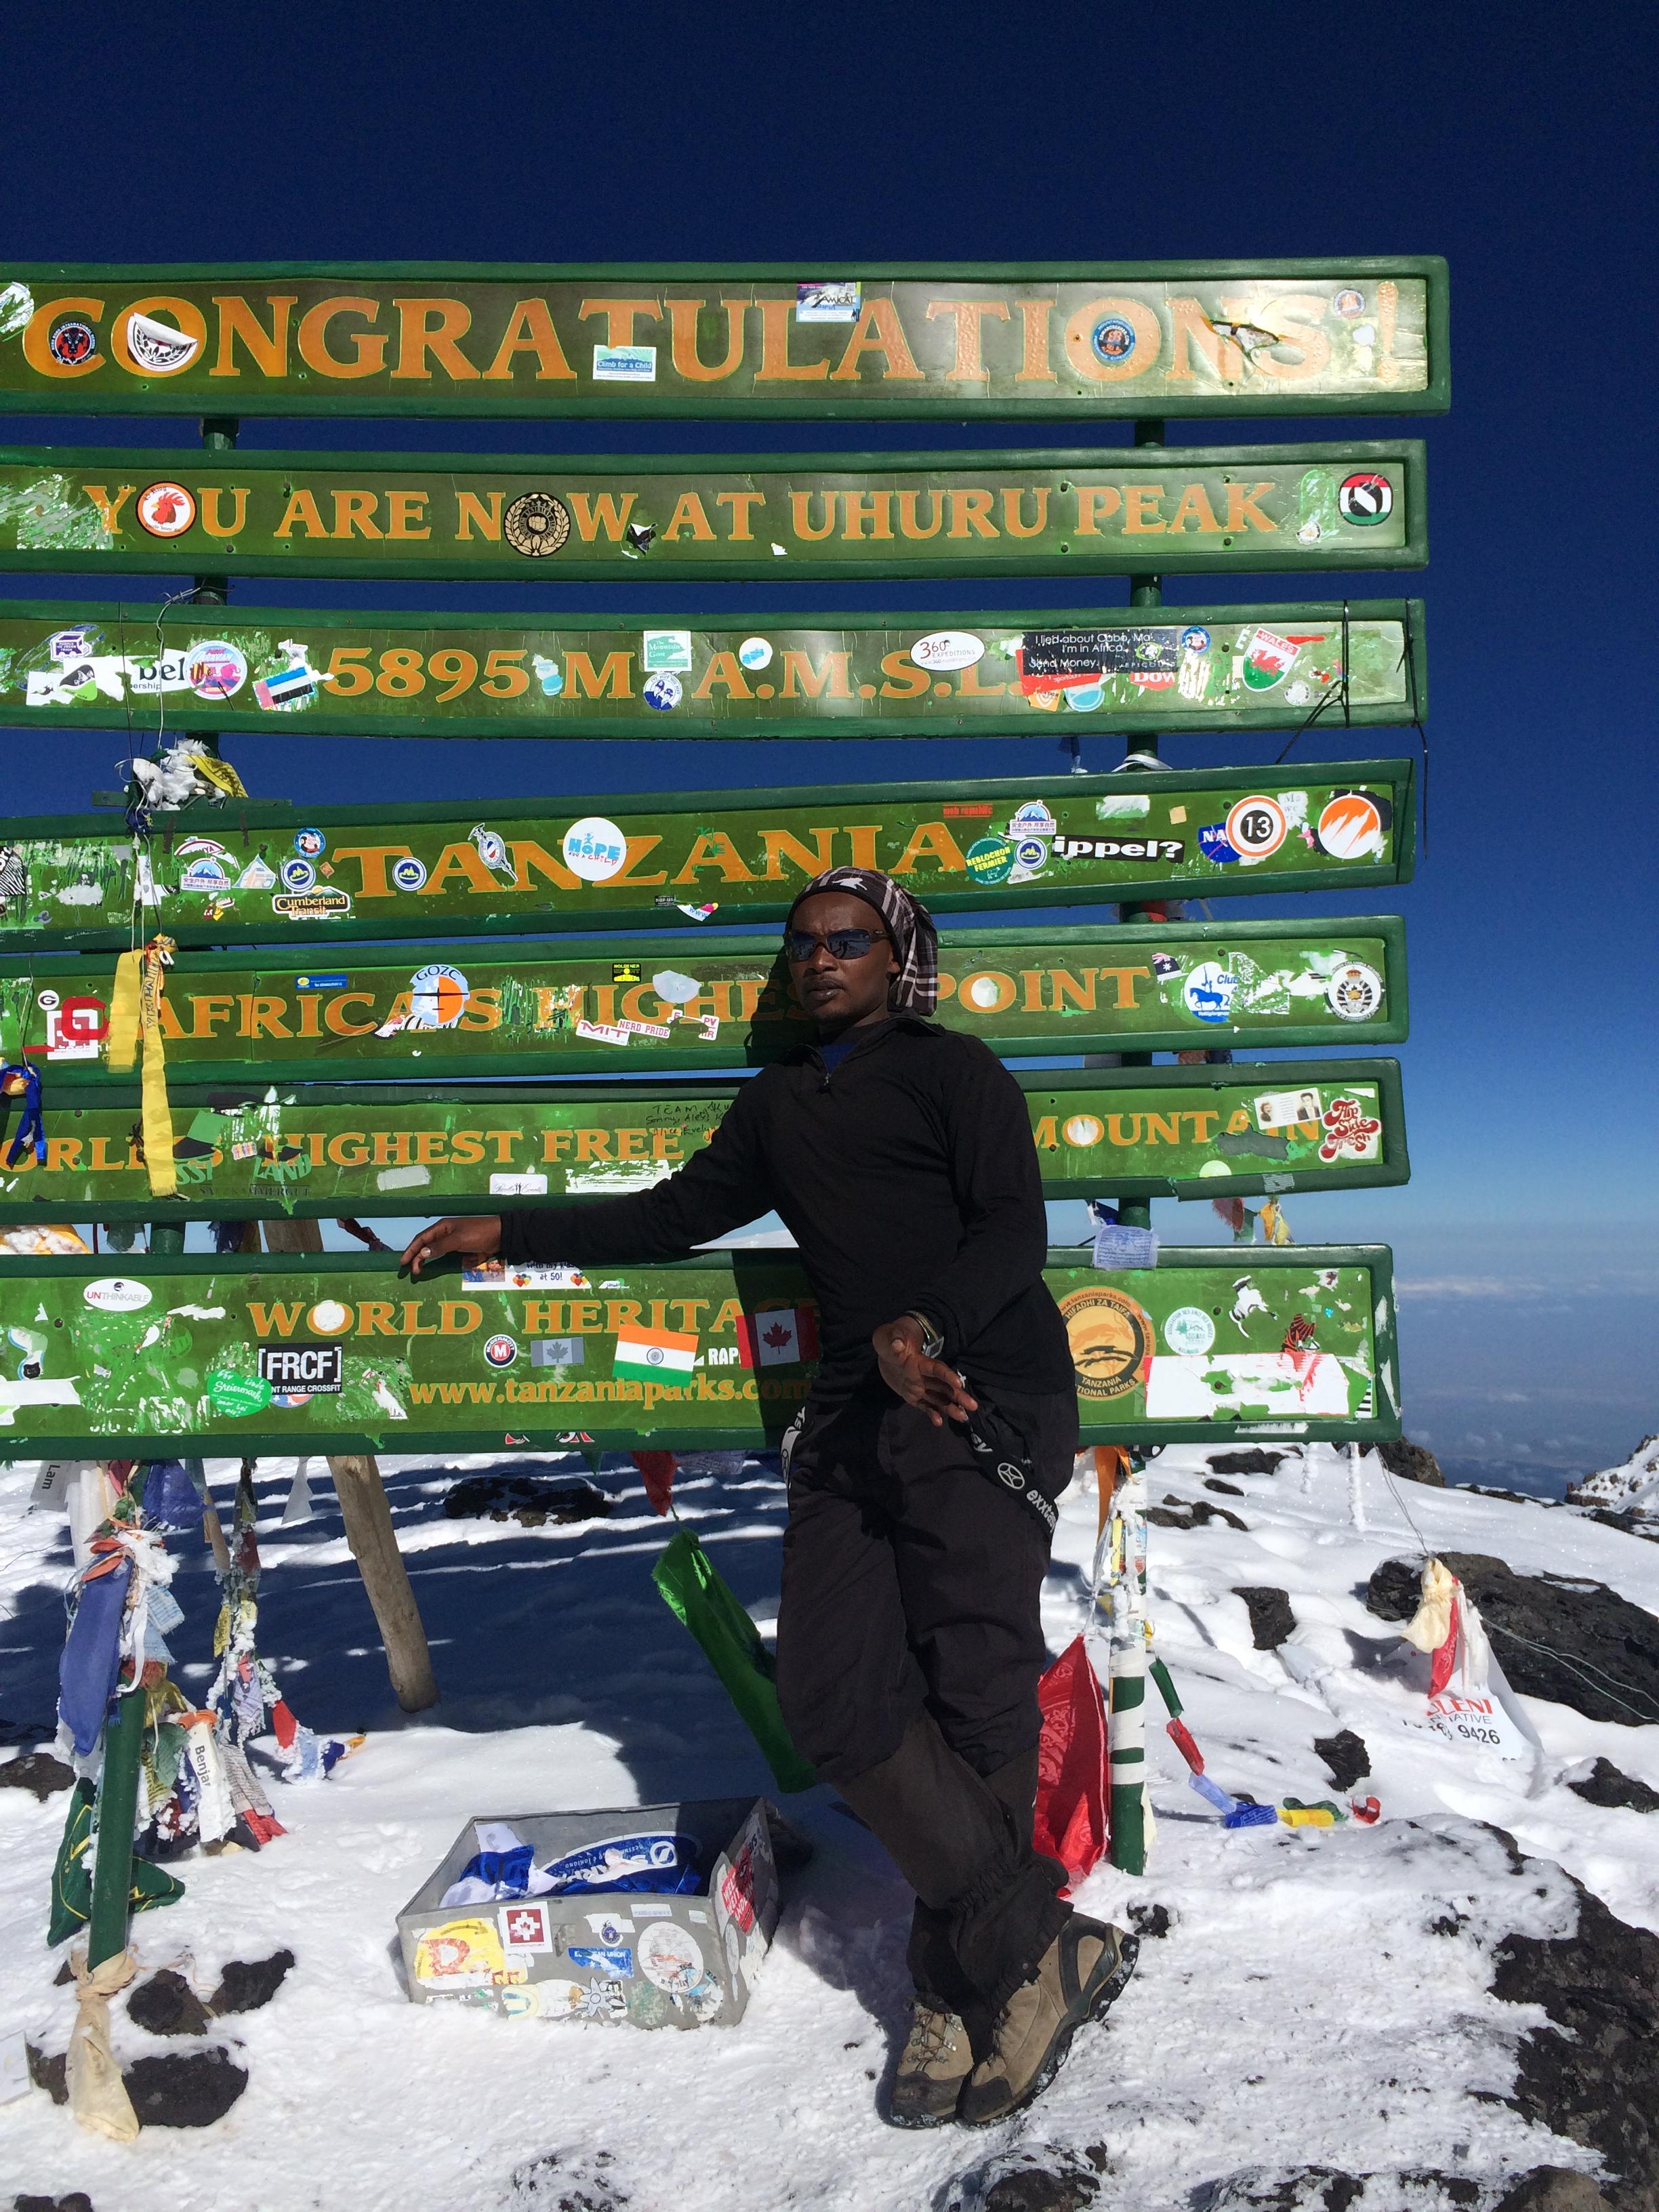 climber in Uhuru peak